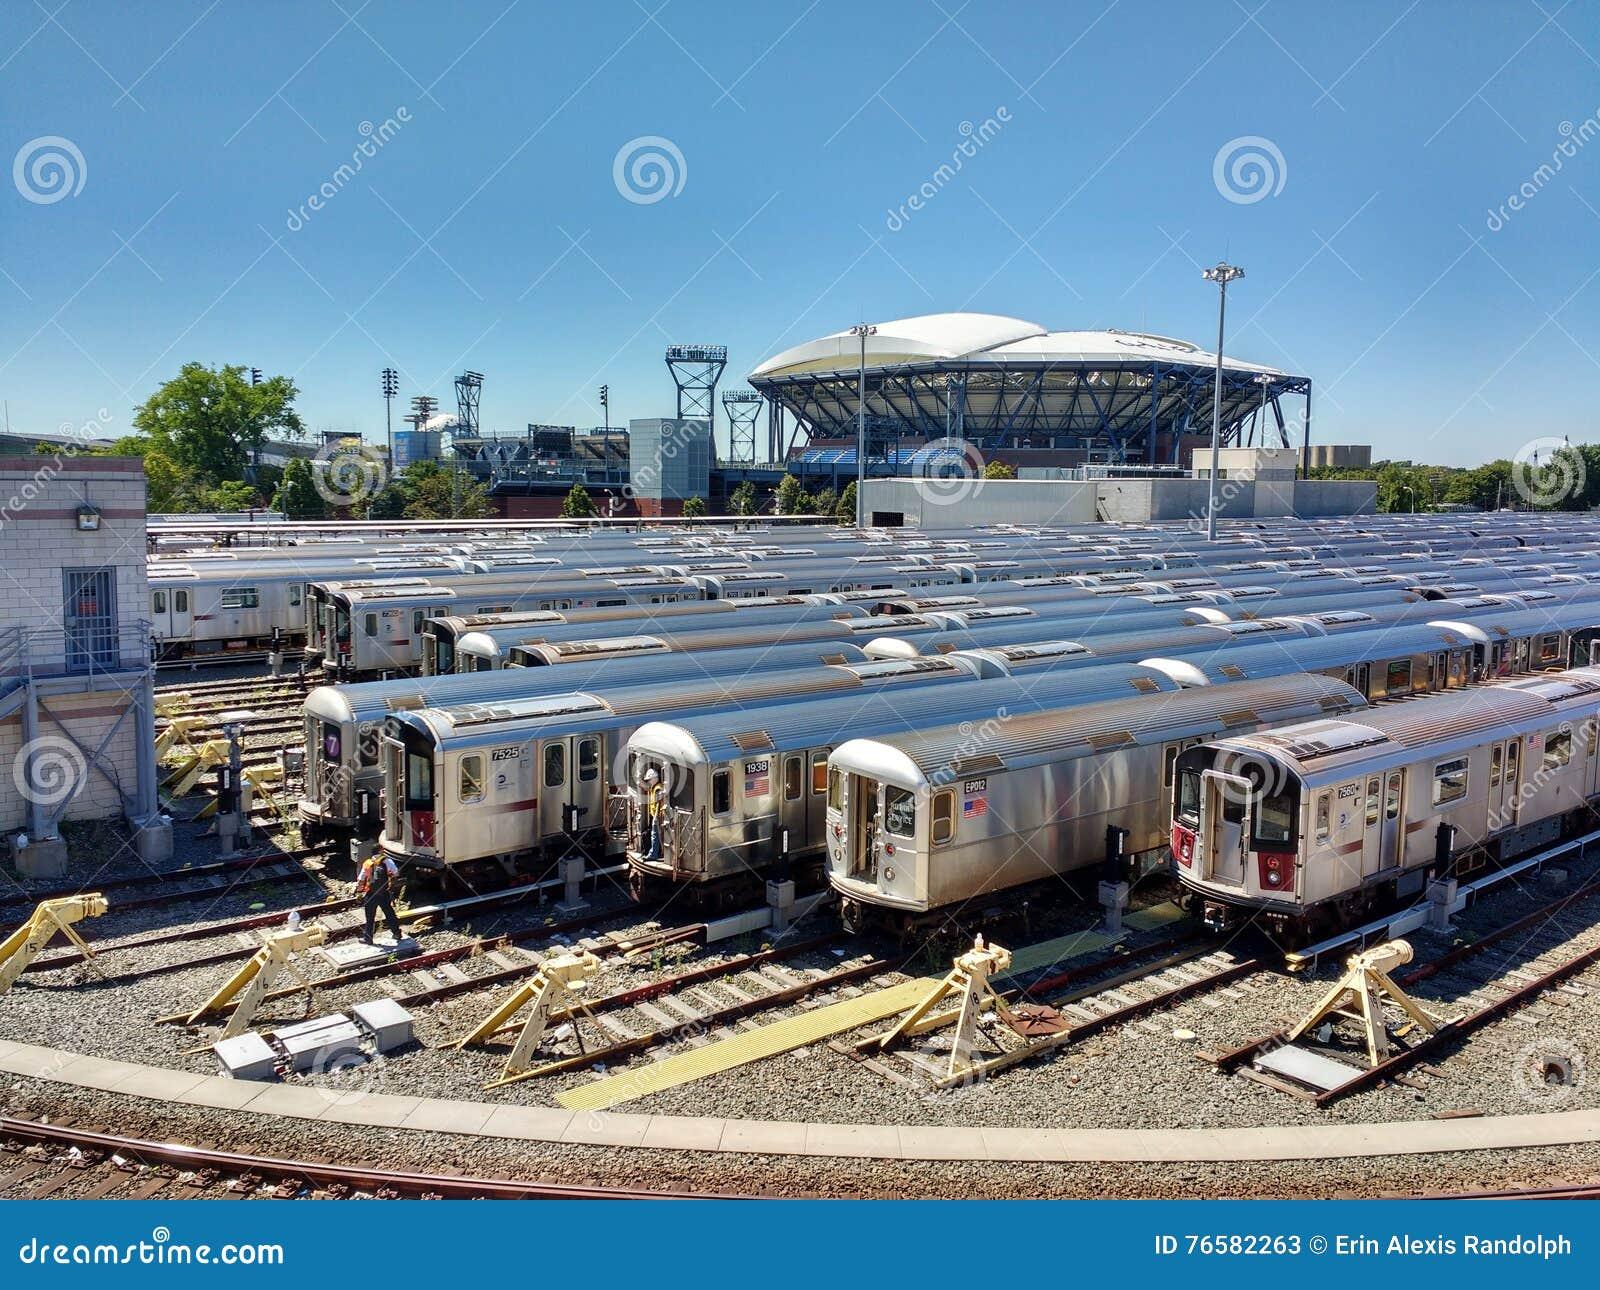 Arthur Ashe Tennis Stadium von Corona Rail Yard, New York, USA